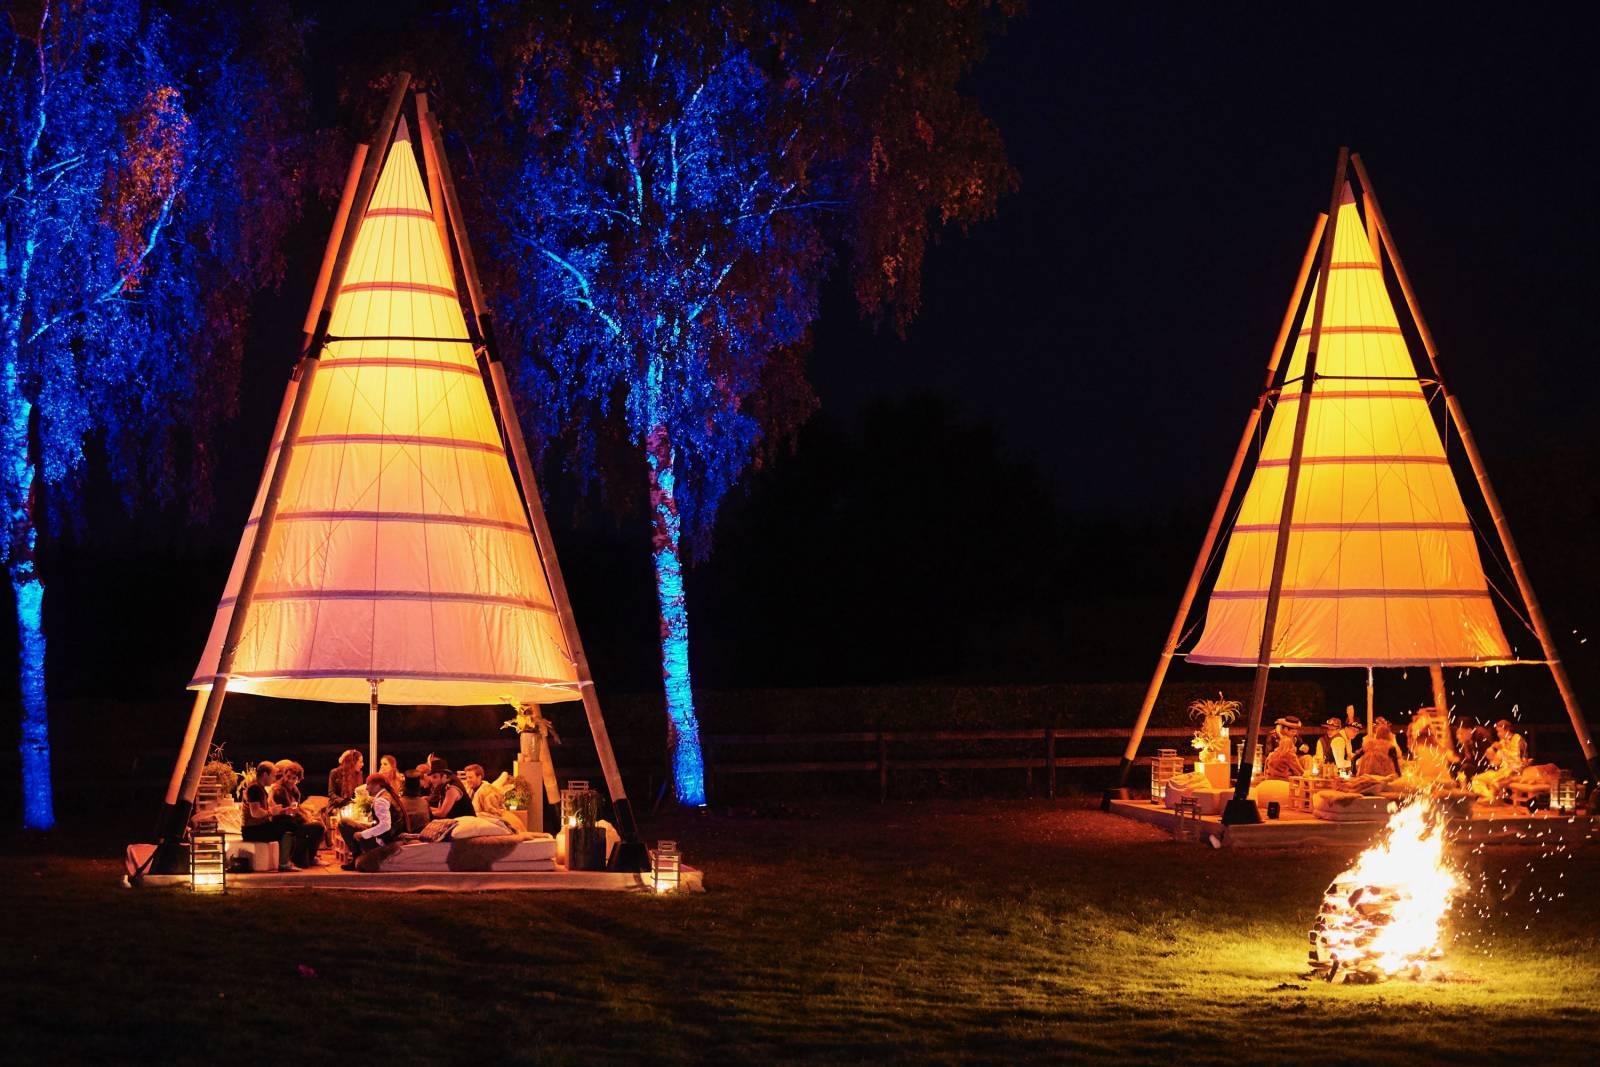 Organic-Concepts - Event Tenten - Feesttenten - Verhuur tenten - Bamboo Tipi - House of Events - 2